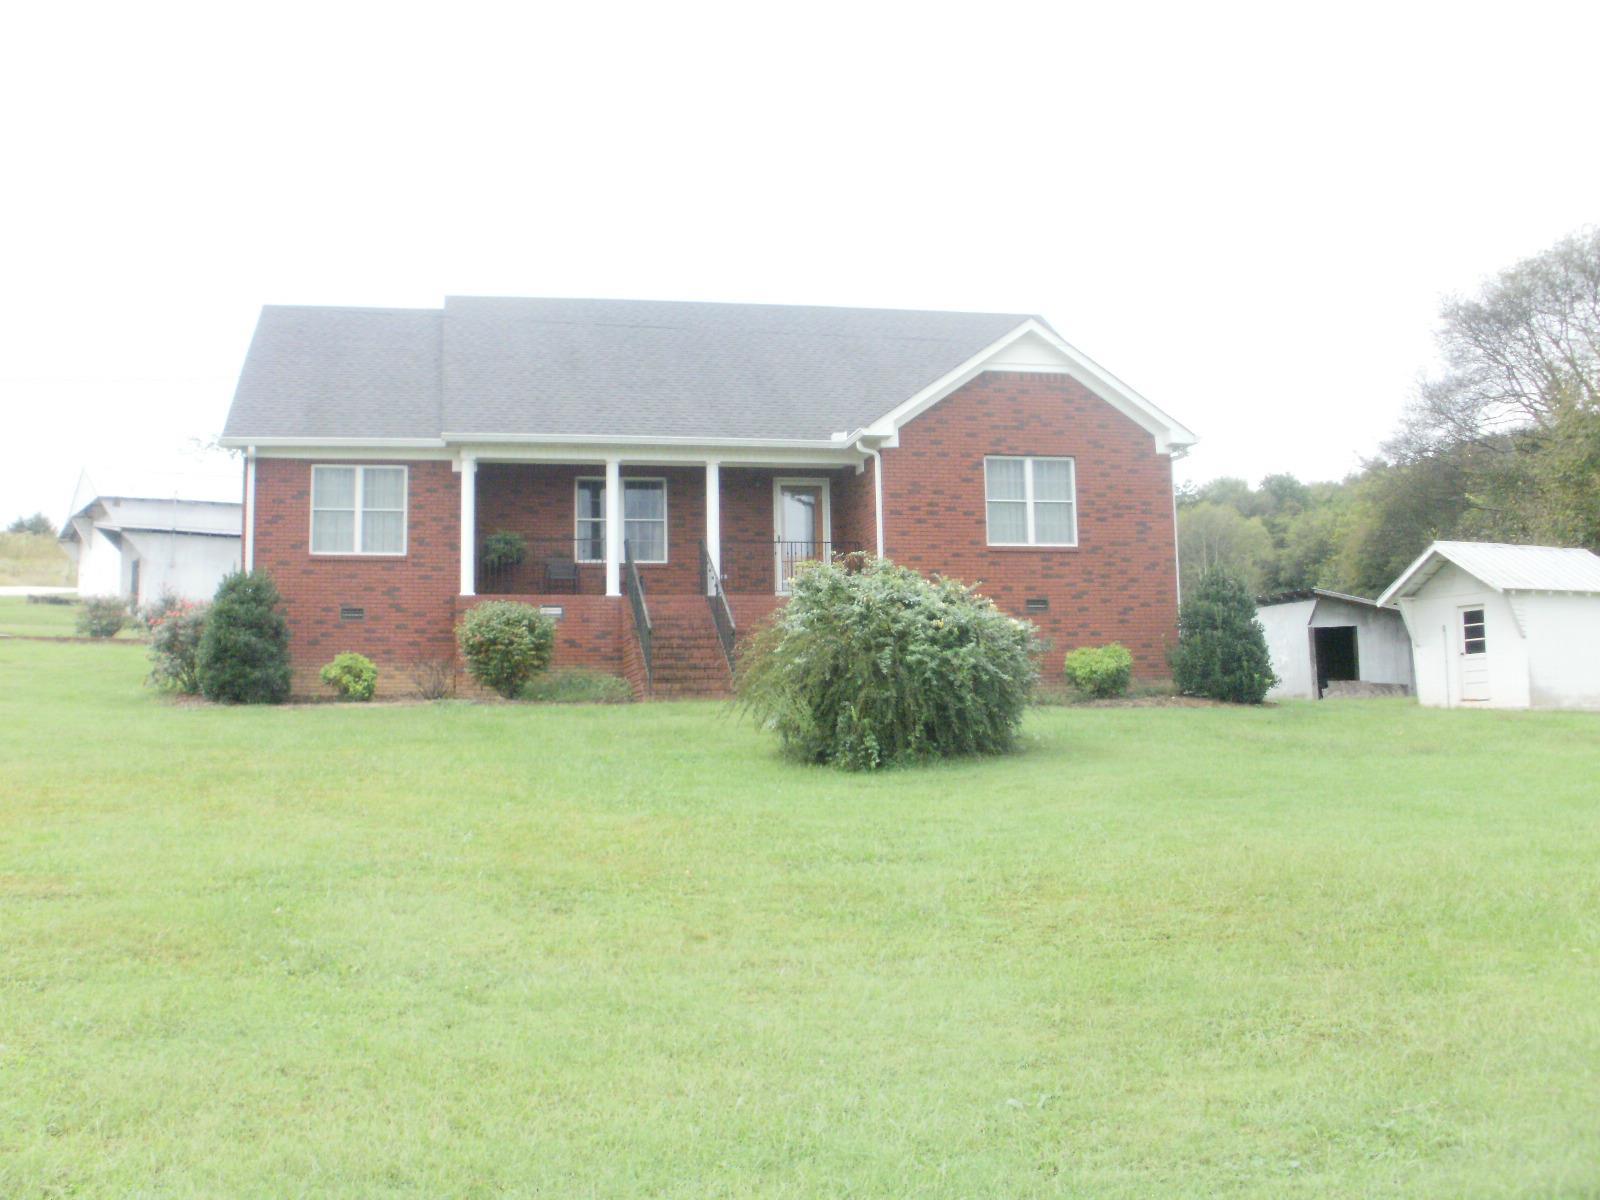 2701 Charity Rd, Fayetteville, TN 37334 - Fayetteville, TN real estate listing